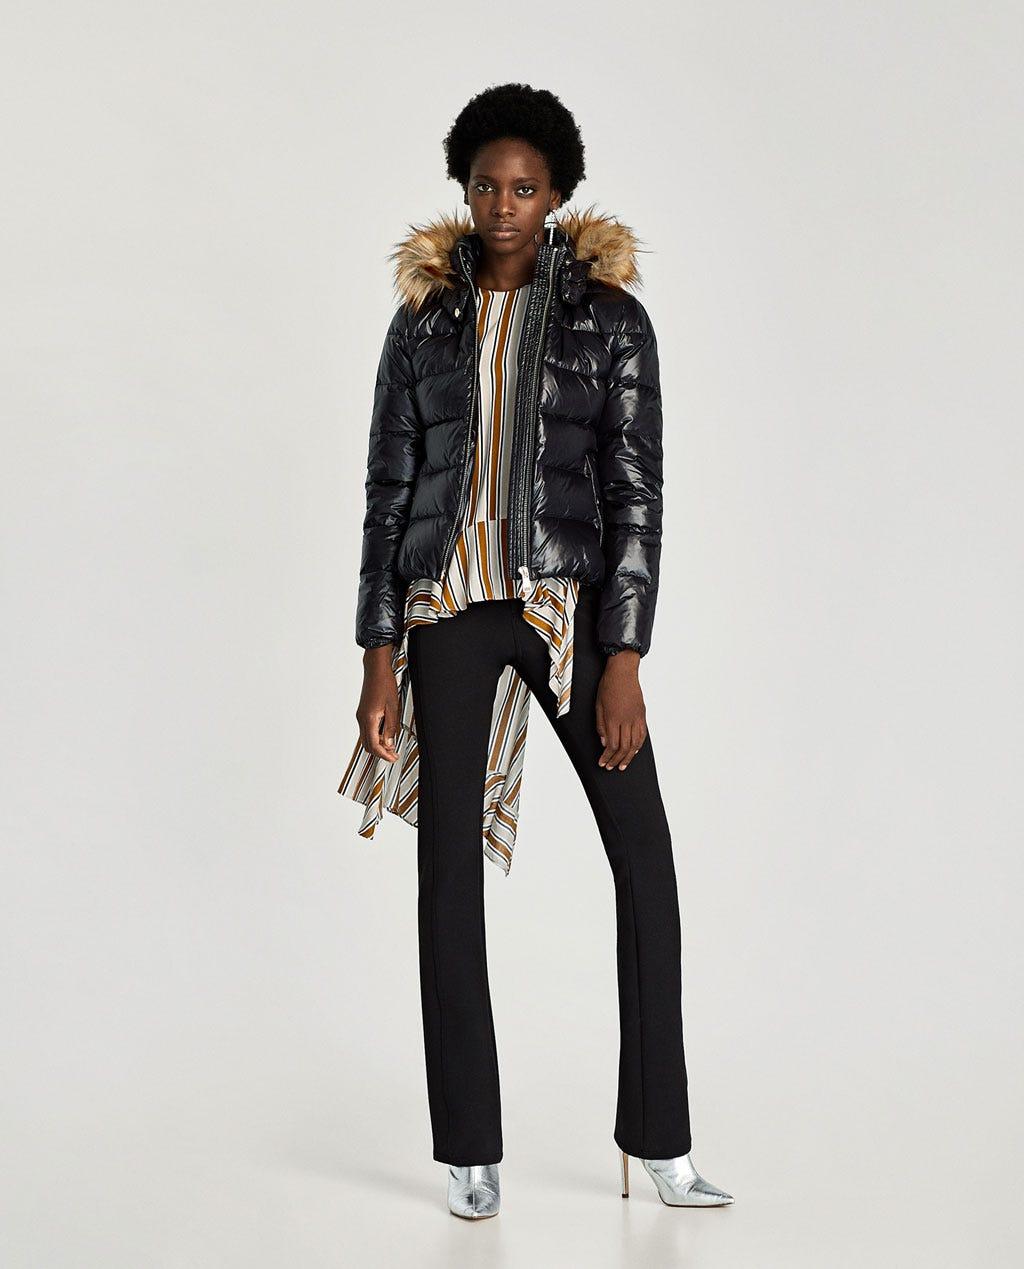 277c57611507 Zara Winter 2017 Best New Puffer Jacket Coats Shop Now